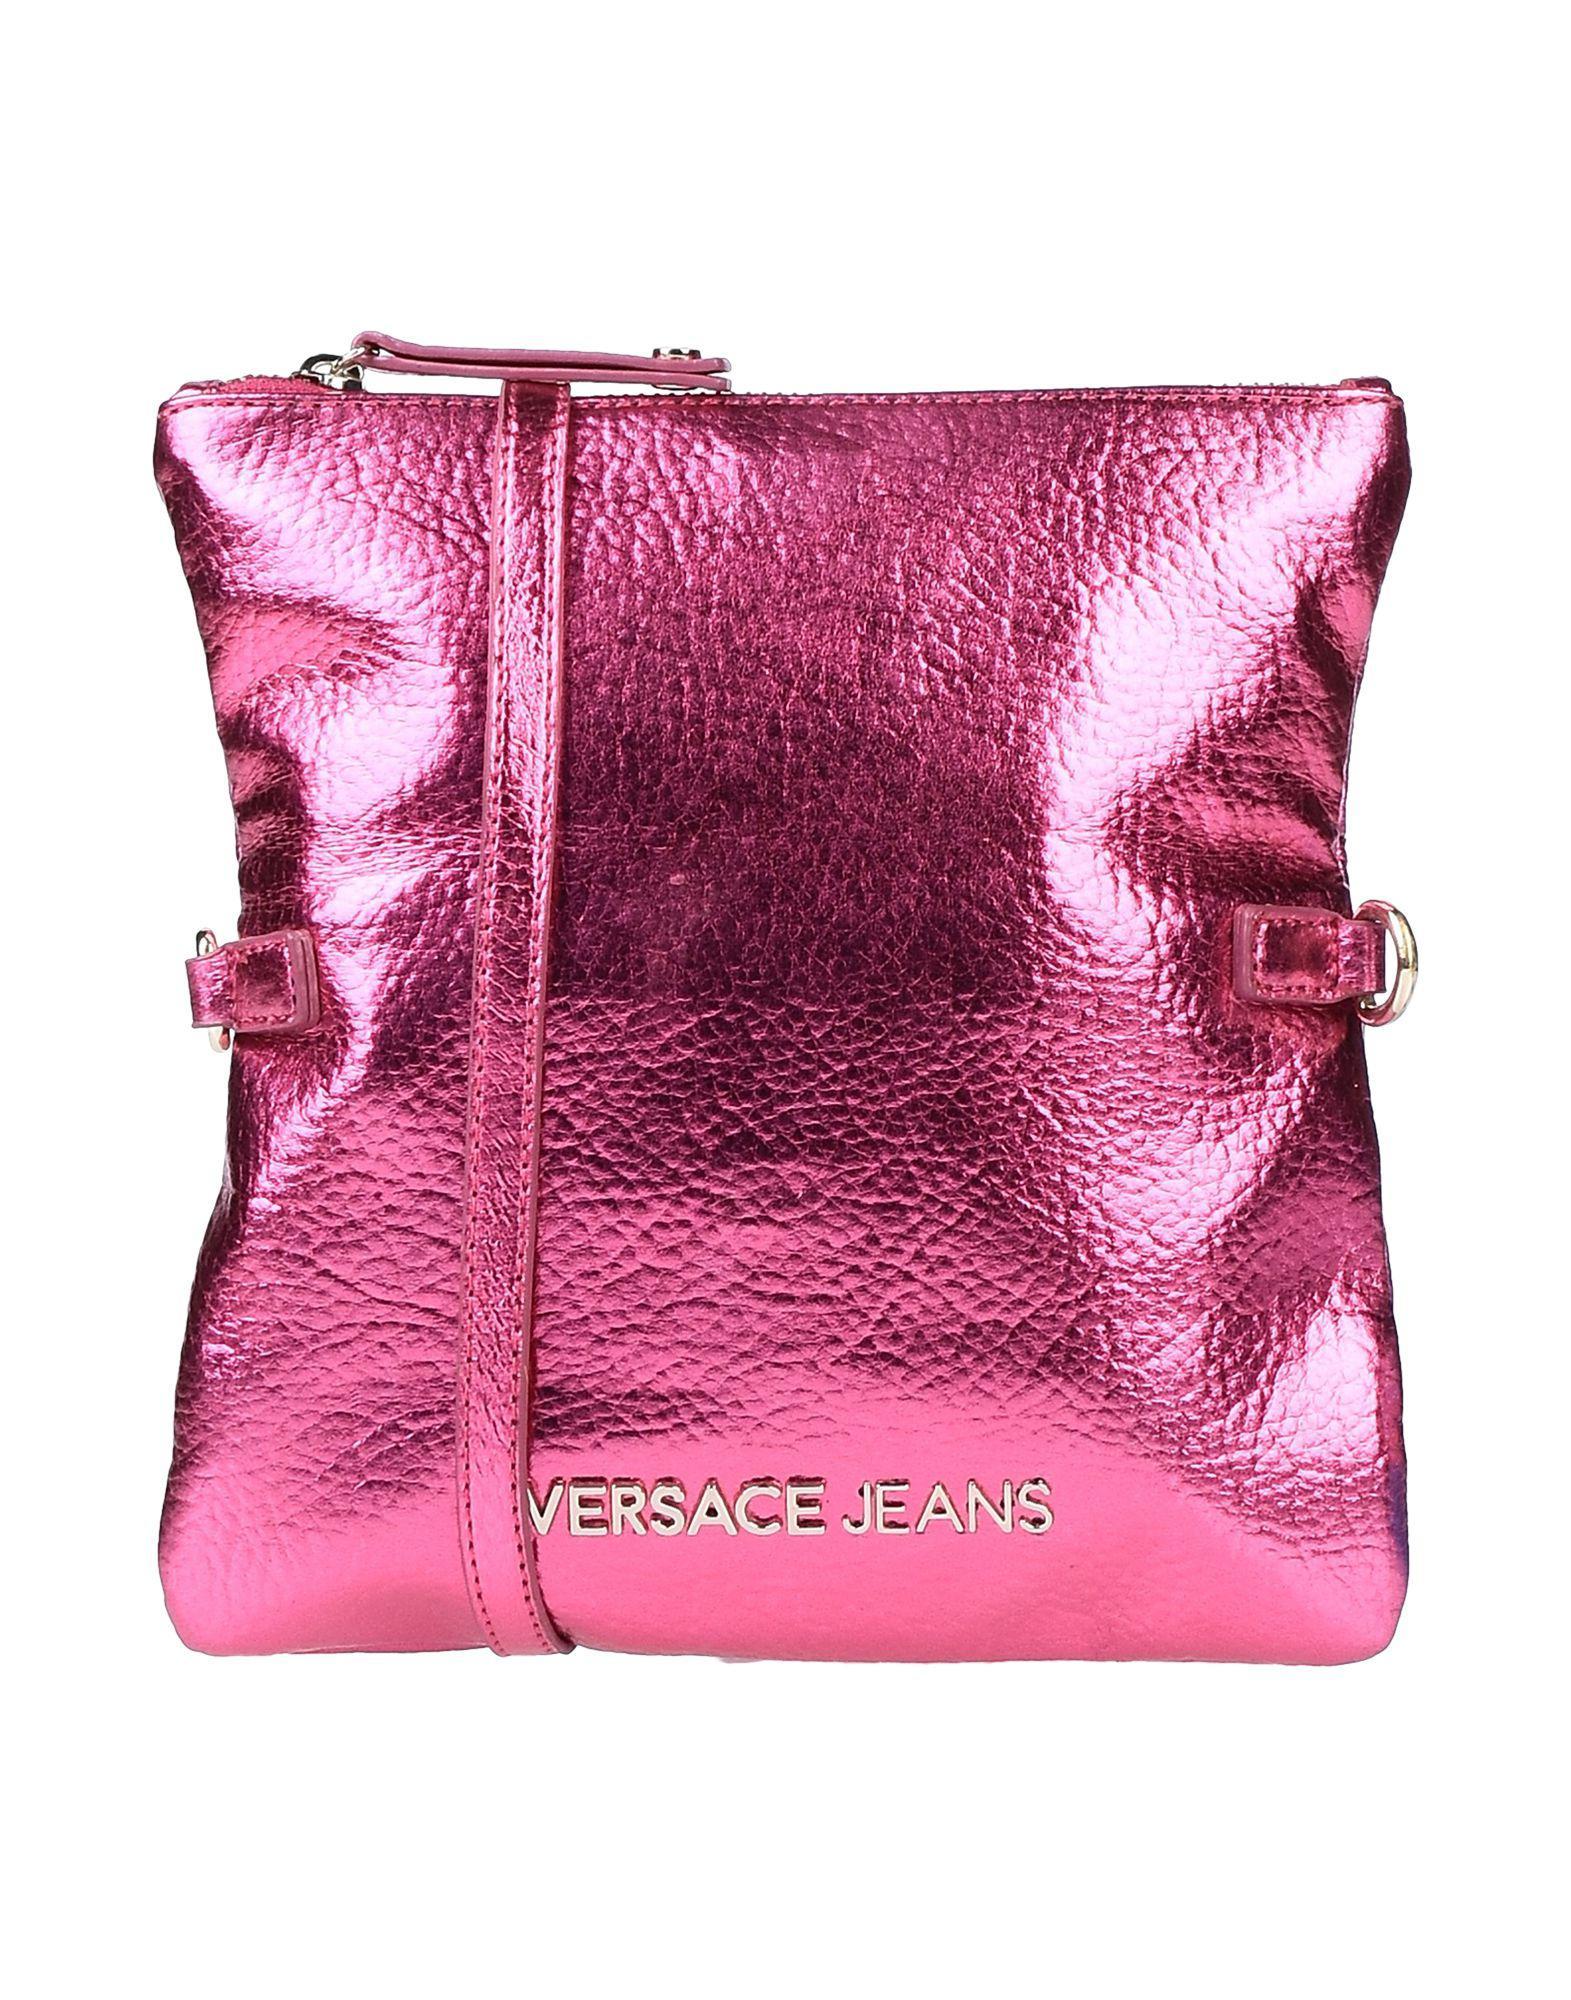 6628952f77 Versace Jeans - Pink Cross-body Bag - Lyst. View fullscreen